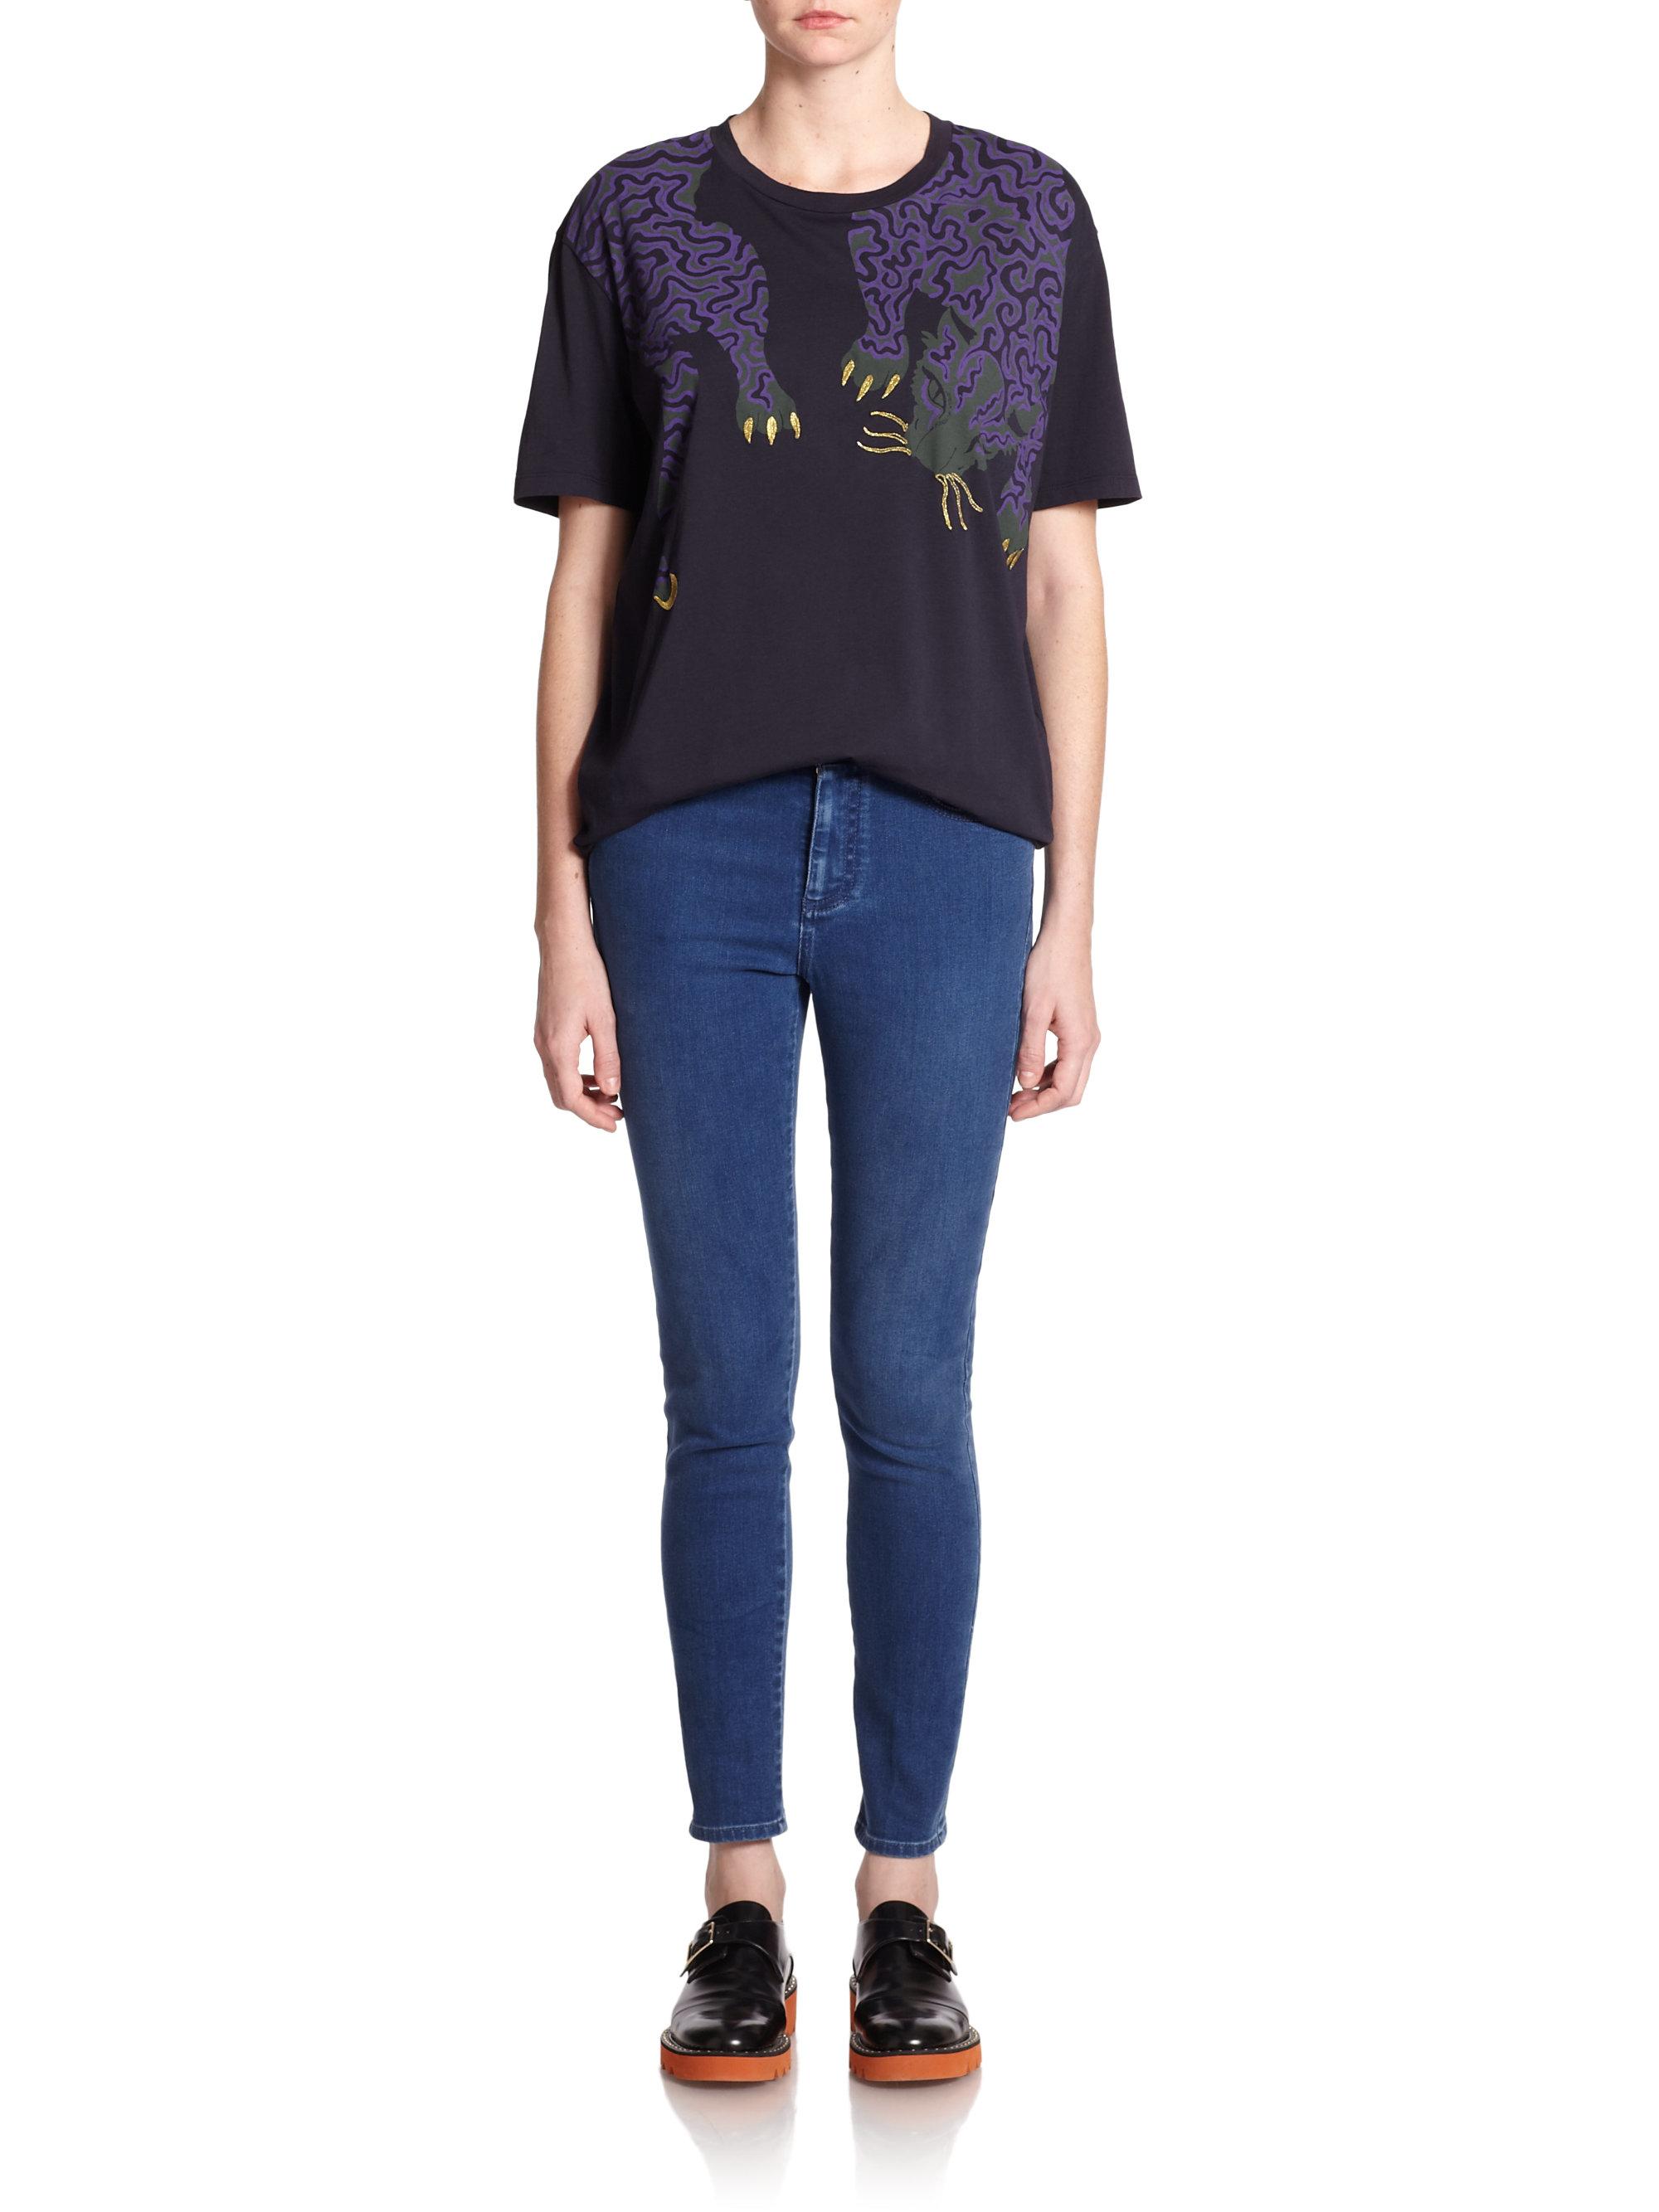 Curled shirt Stella McCartney Fashion Style Sale Online gZ3Fkk